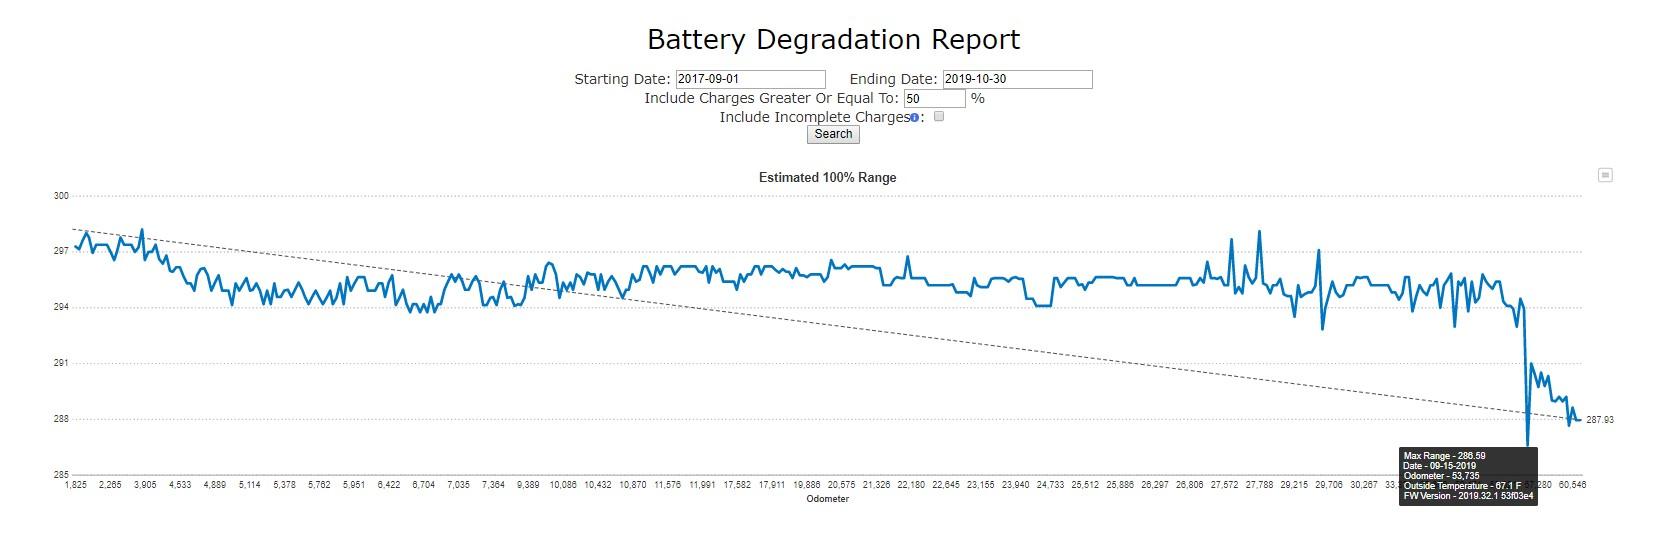 Battery-degradation-report-2019-10-30 171208.jpg